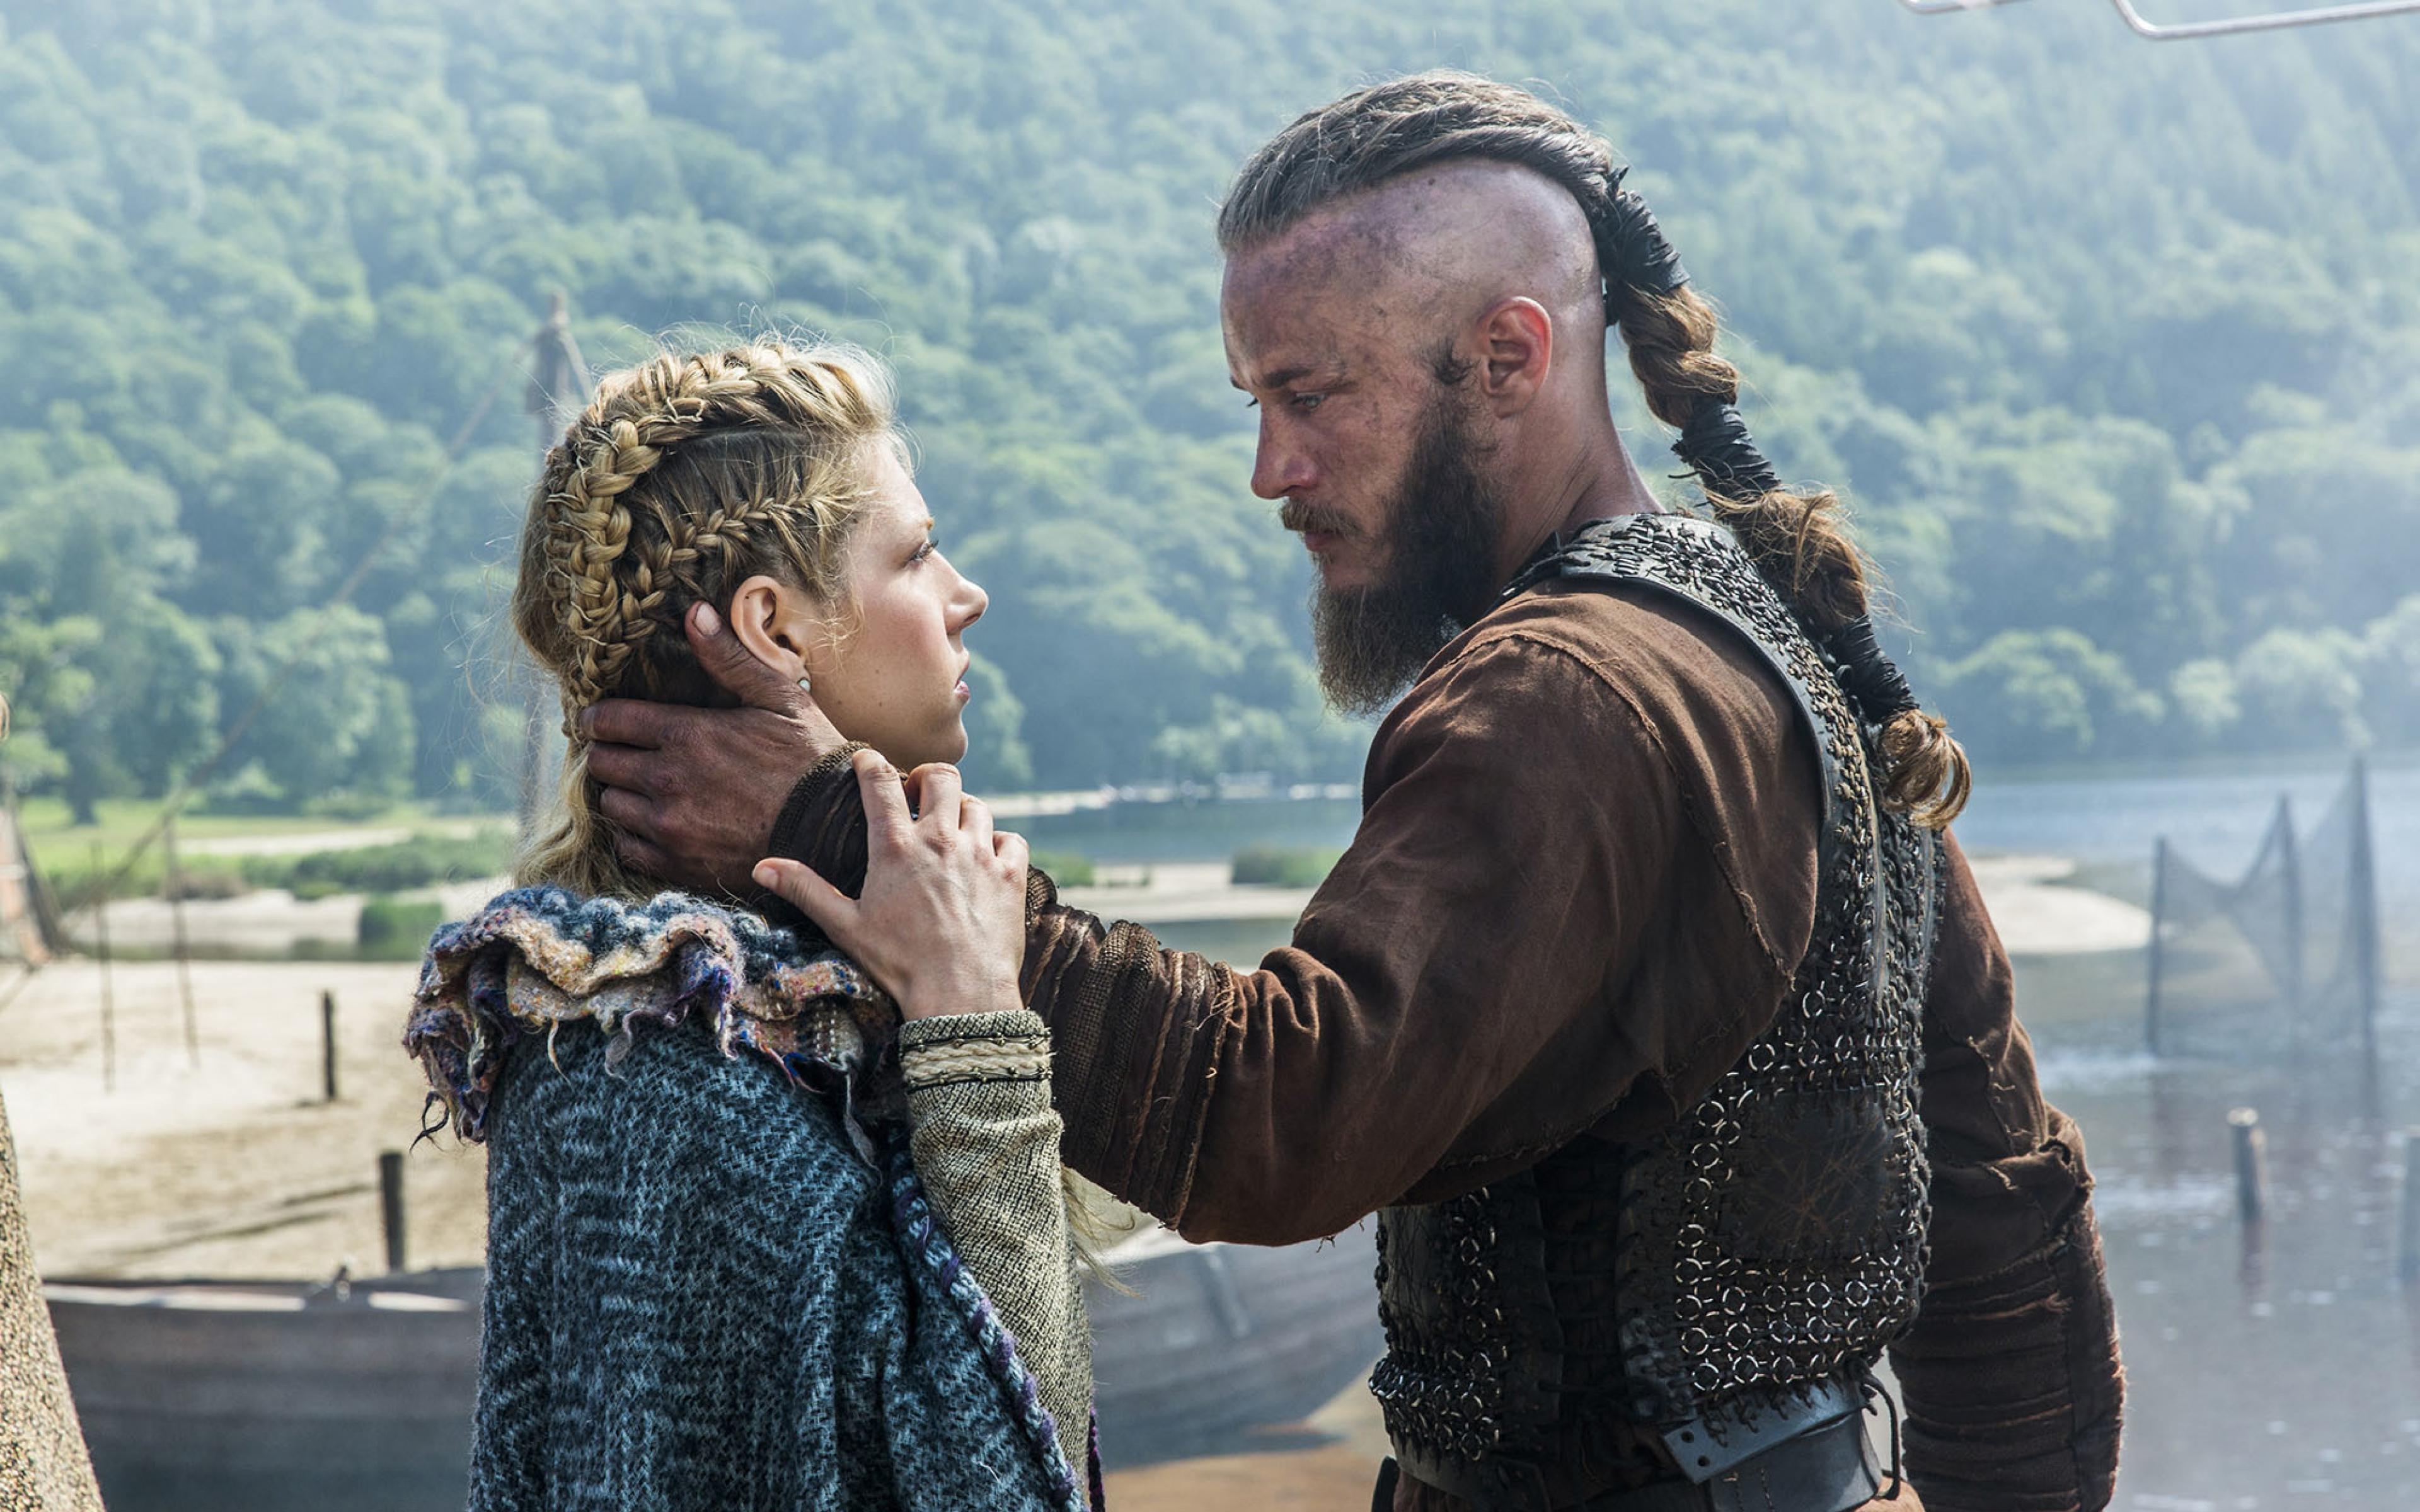 Lagertha the Shieldmaiden, Ragnar Lothbrok's Wife 3